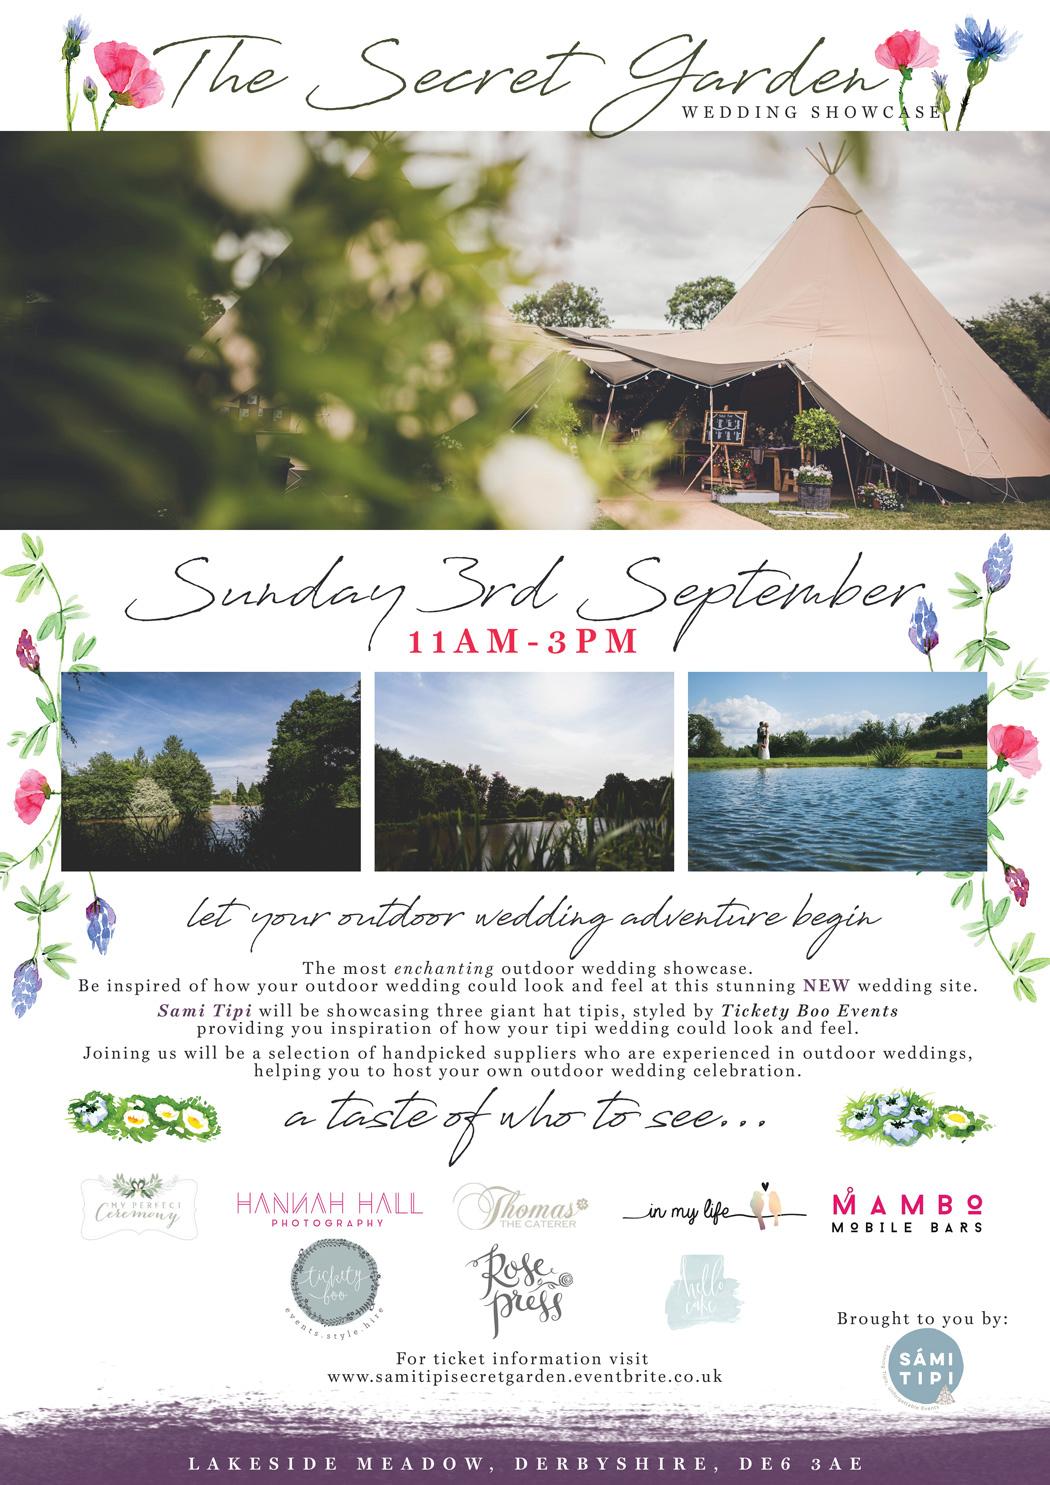 sami-tipi-secret-garden-wedding-showcase